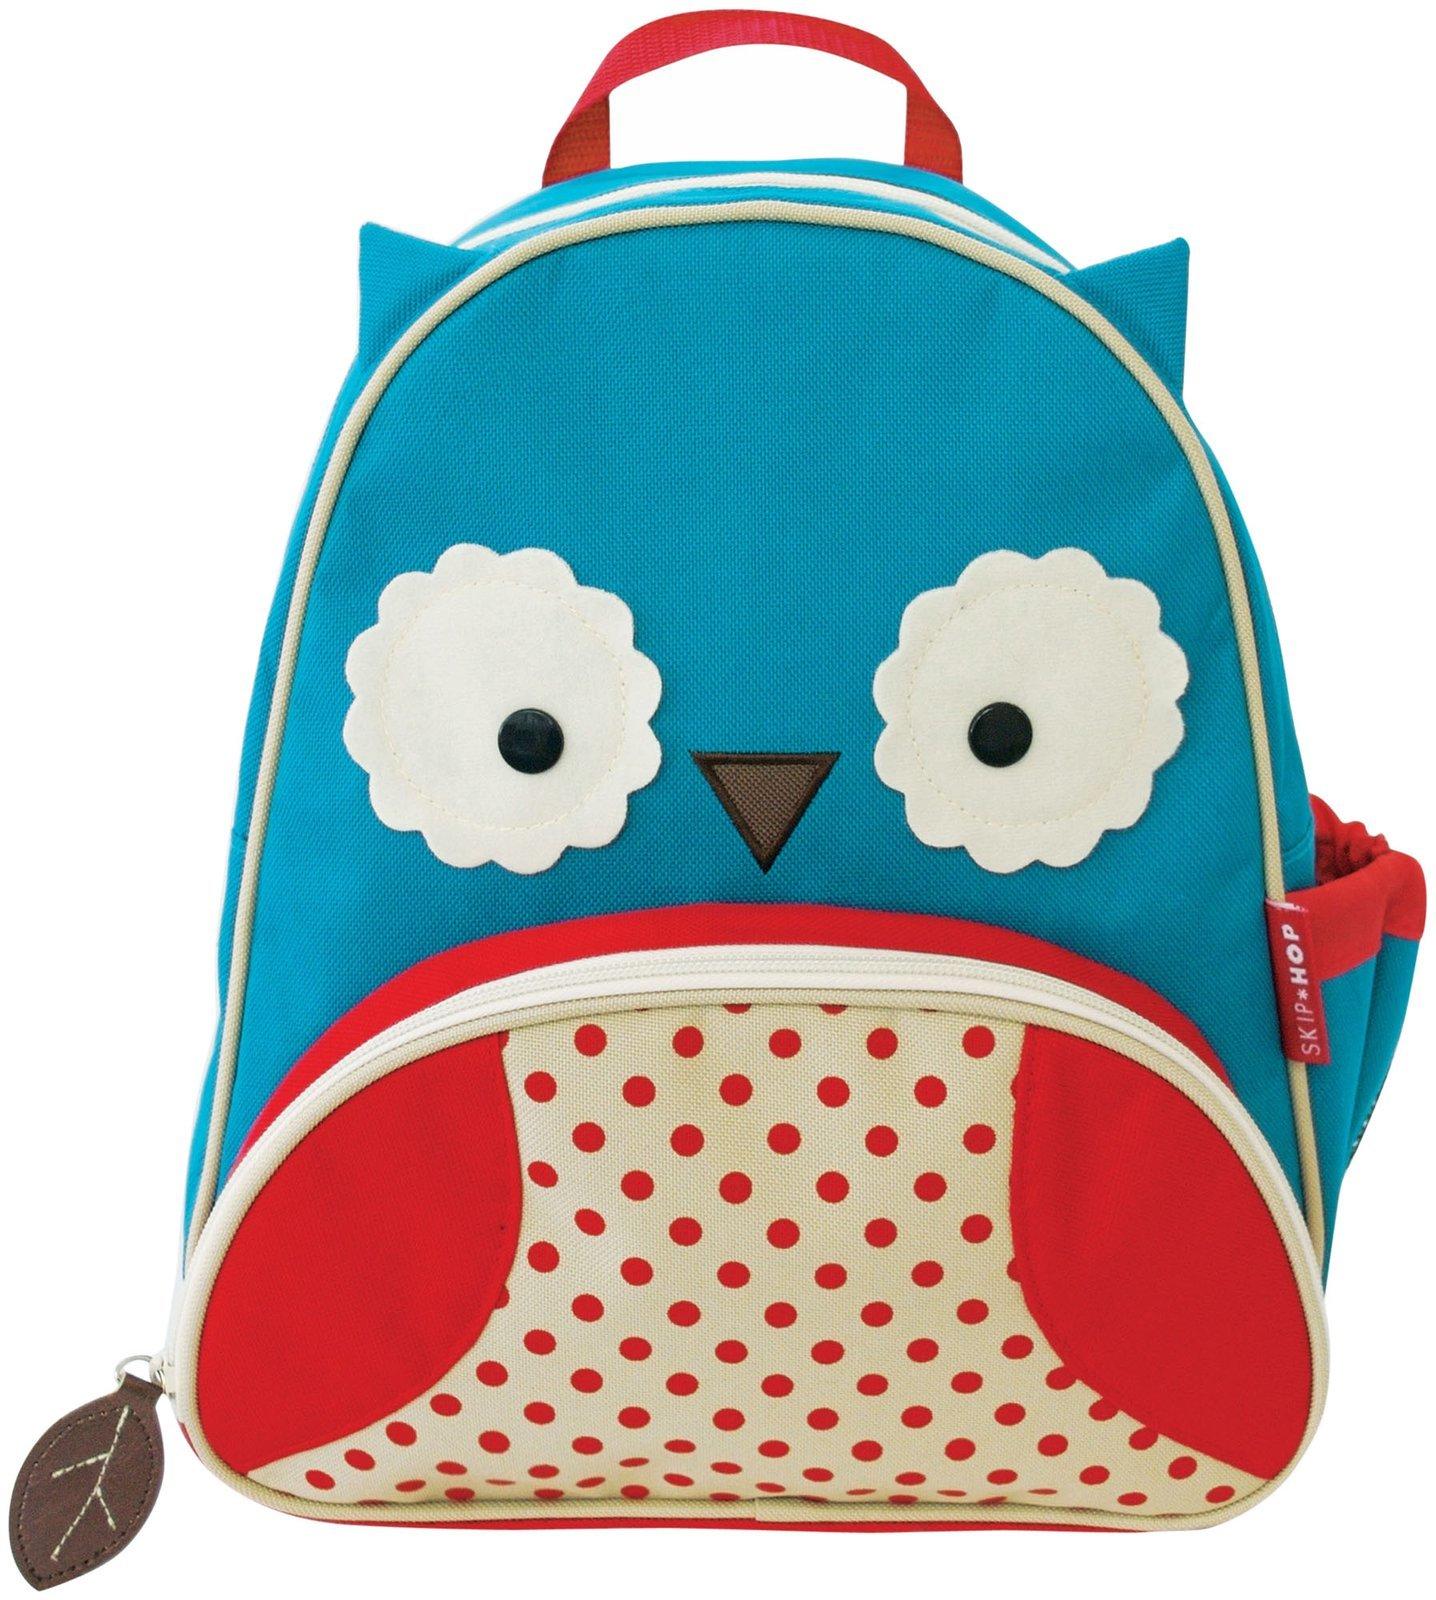 Skip Hop: Zoo Pack - Owl image